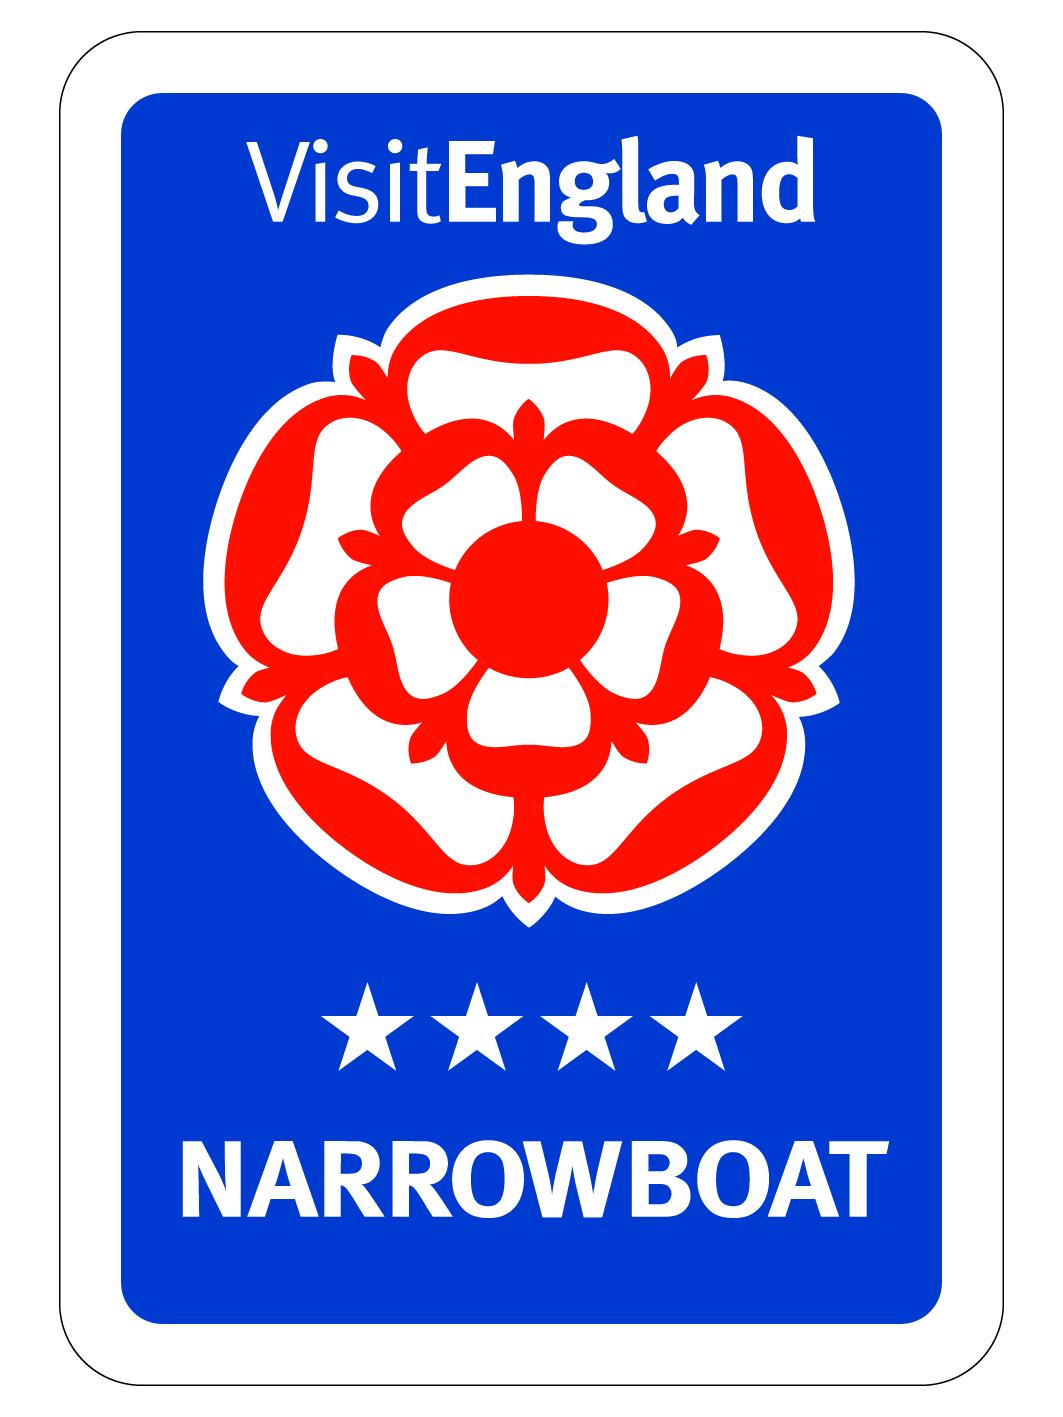 Visit England 4* Narrowboat